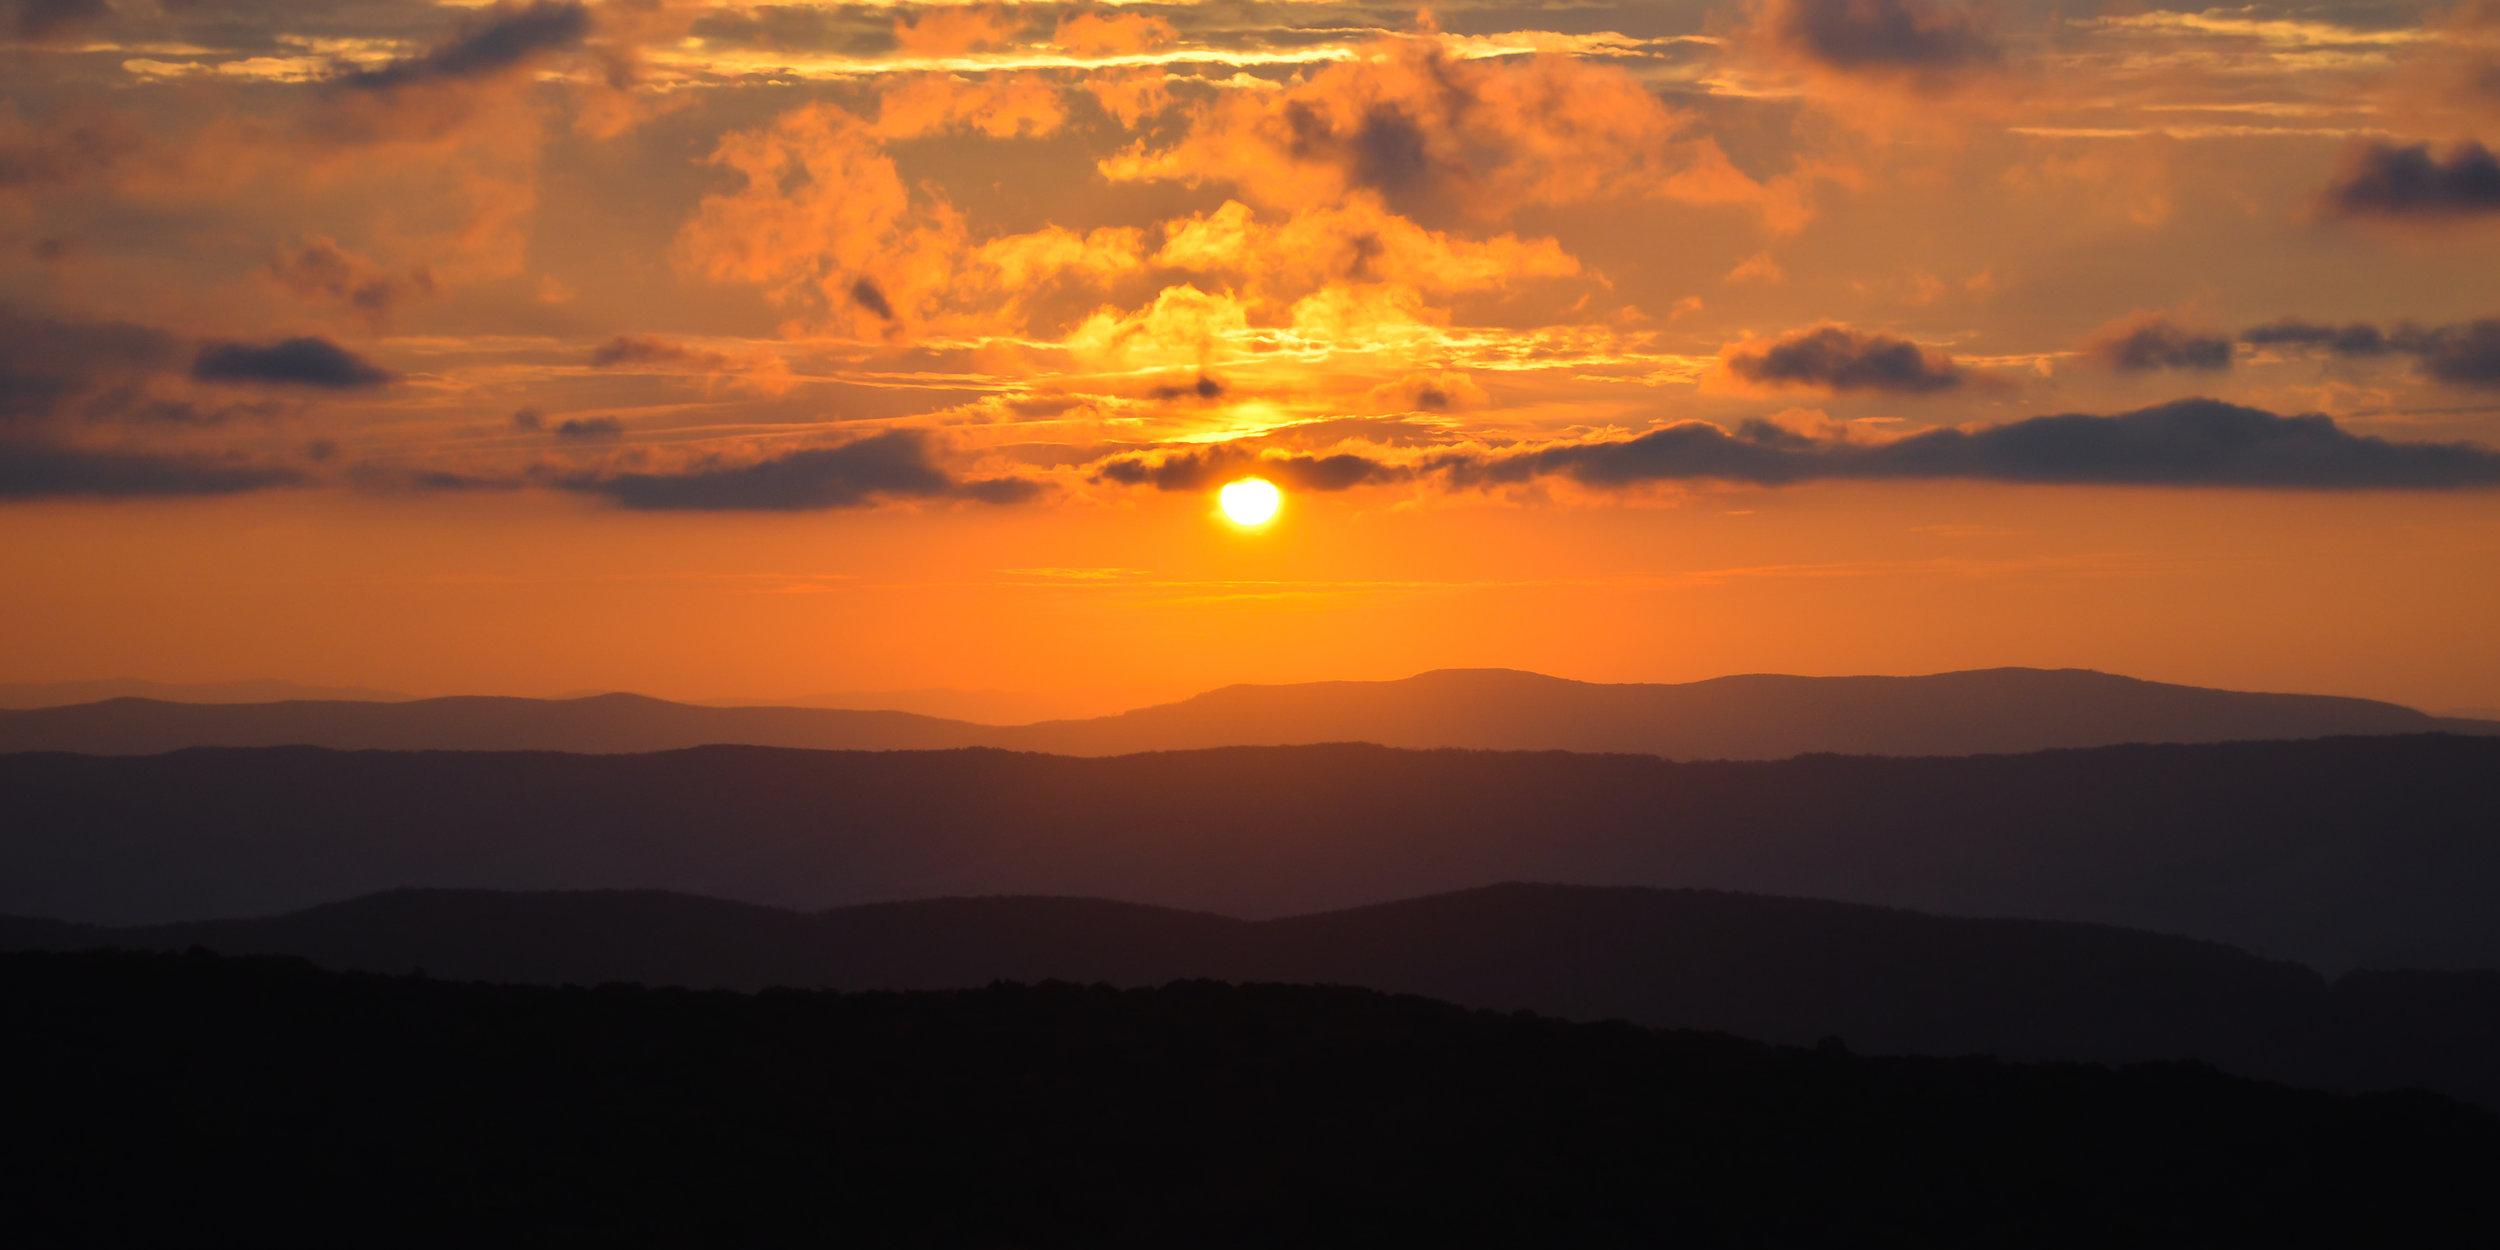 highland county-virginia-sunrise-mountains.jpg